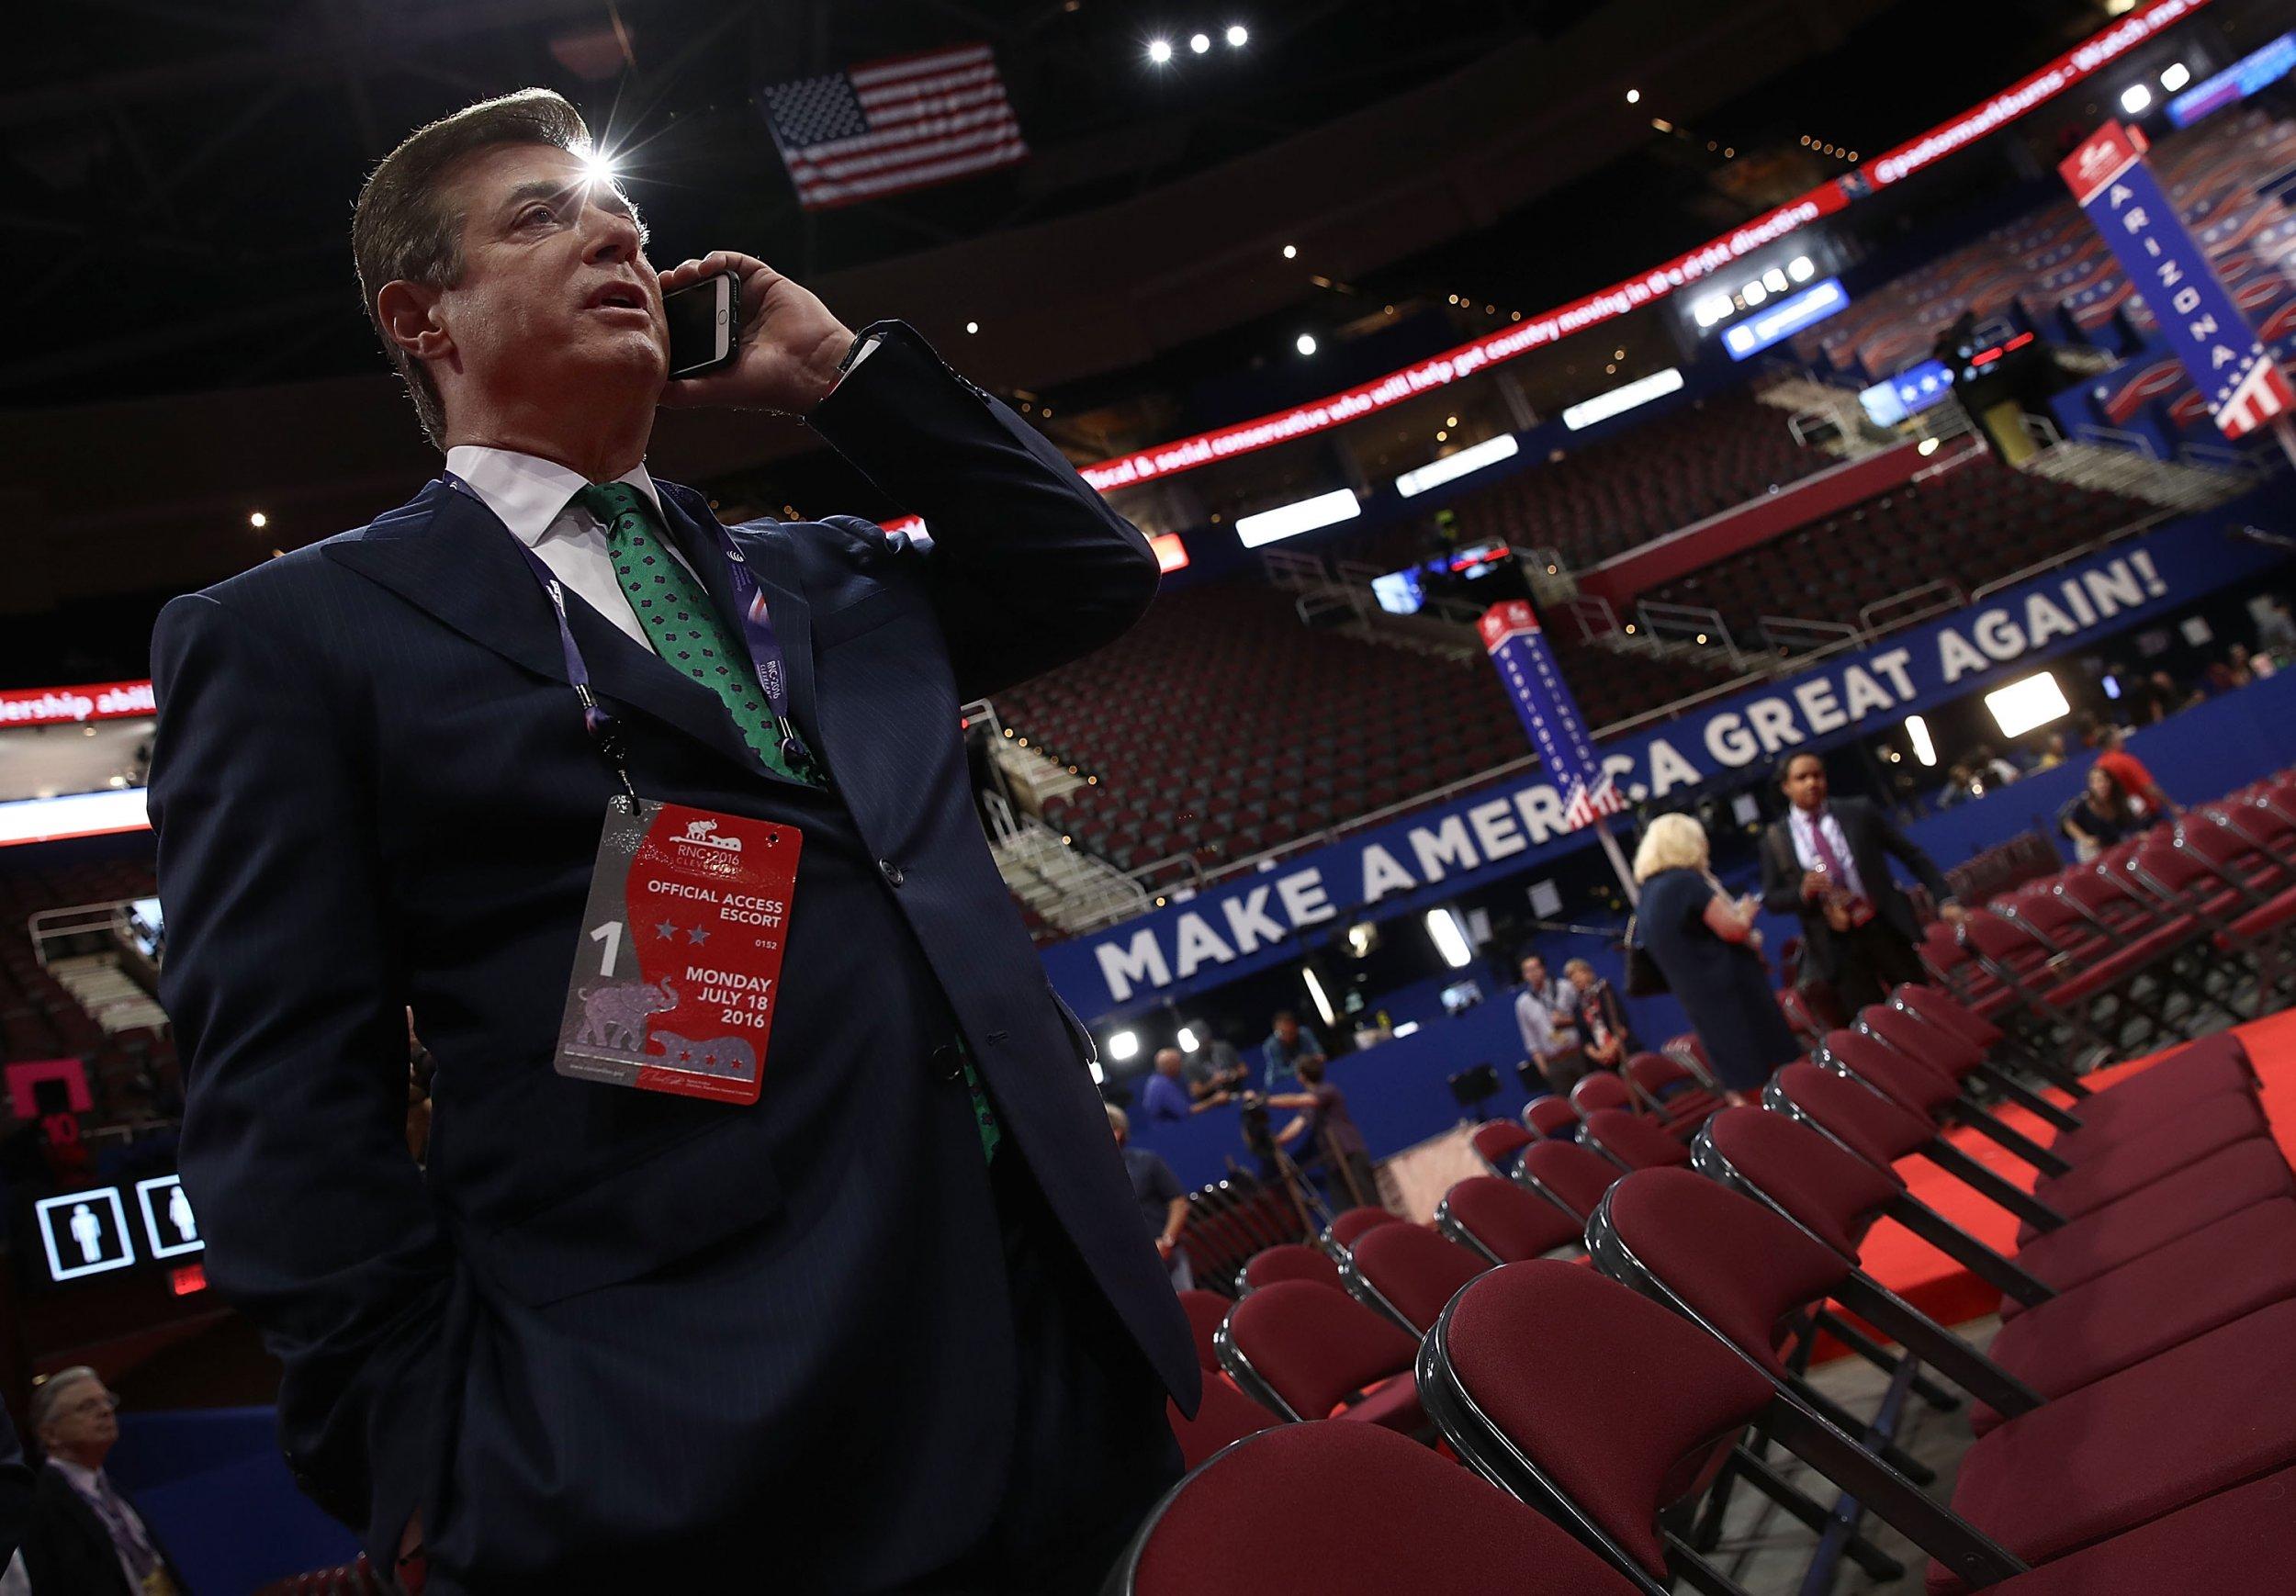 Manafort, Mueller, Tell, Trump, Russia